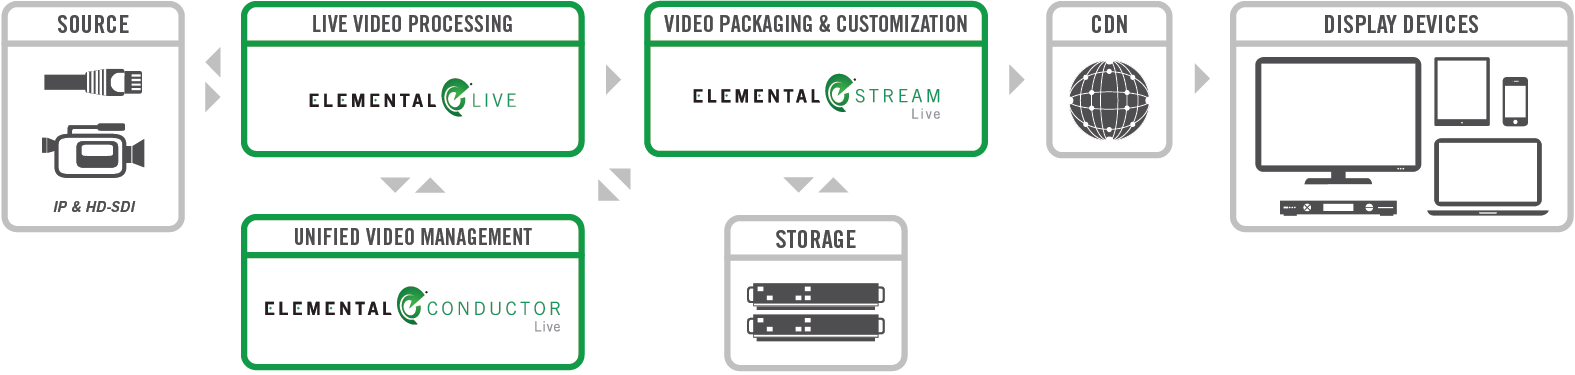 [E]Elemental_Live_Platform_Workflow